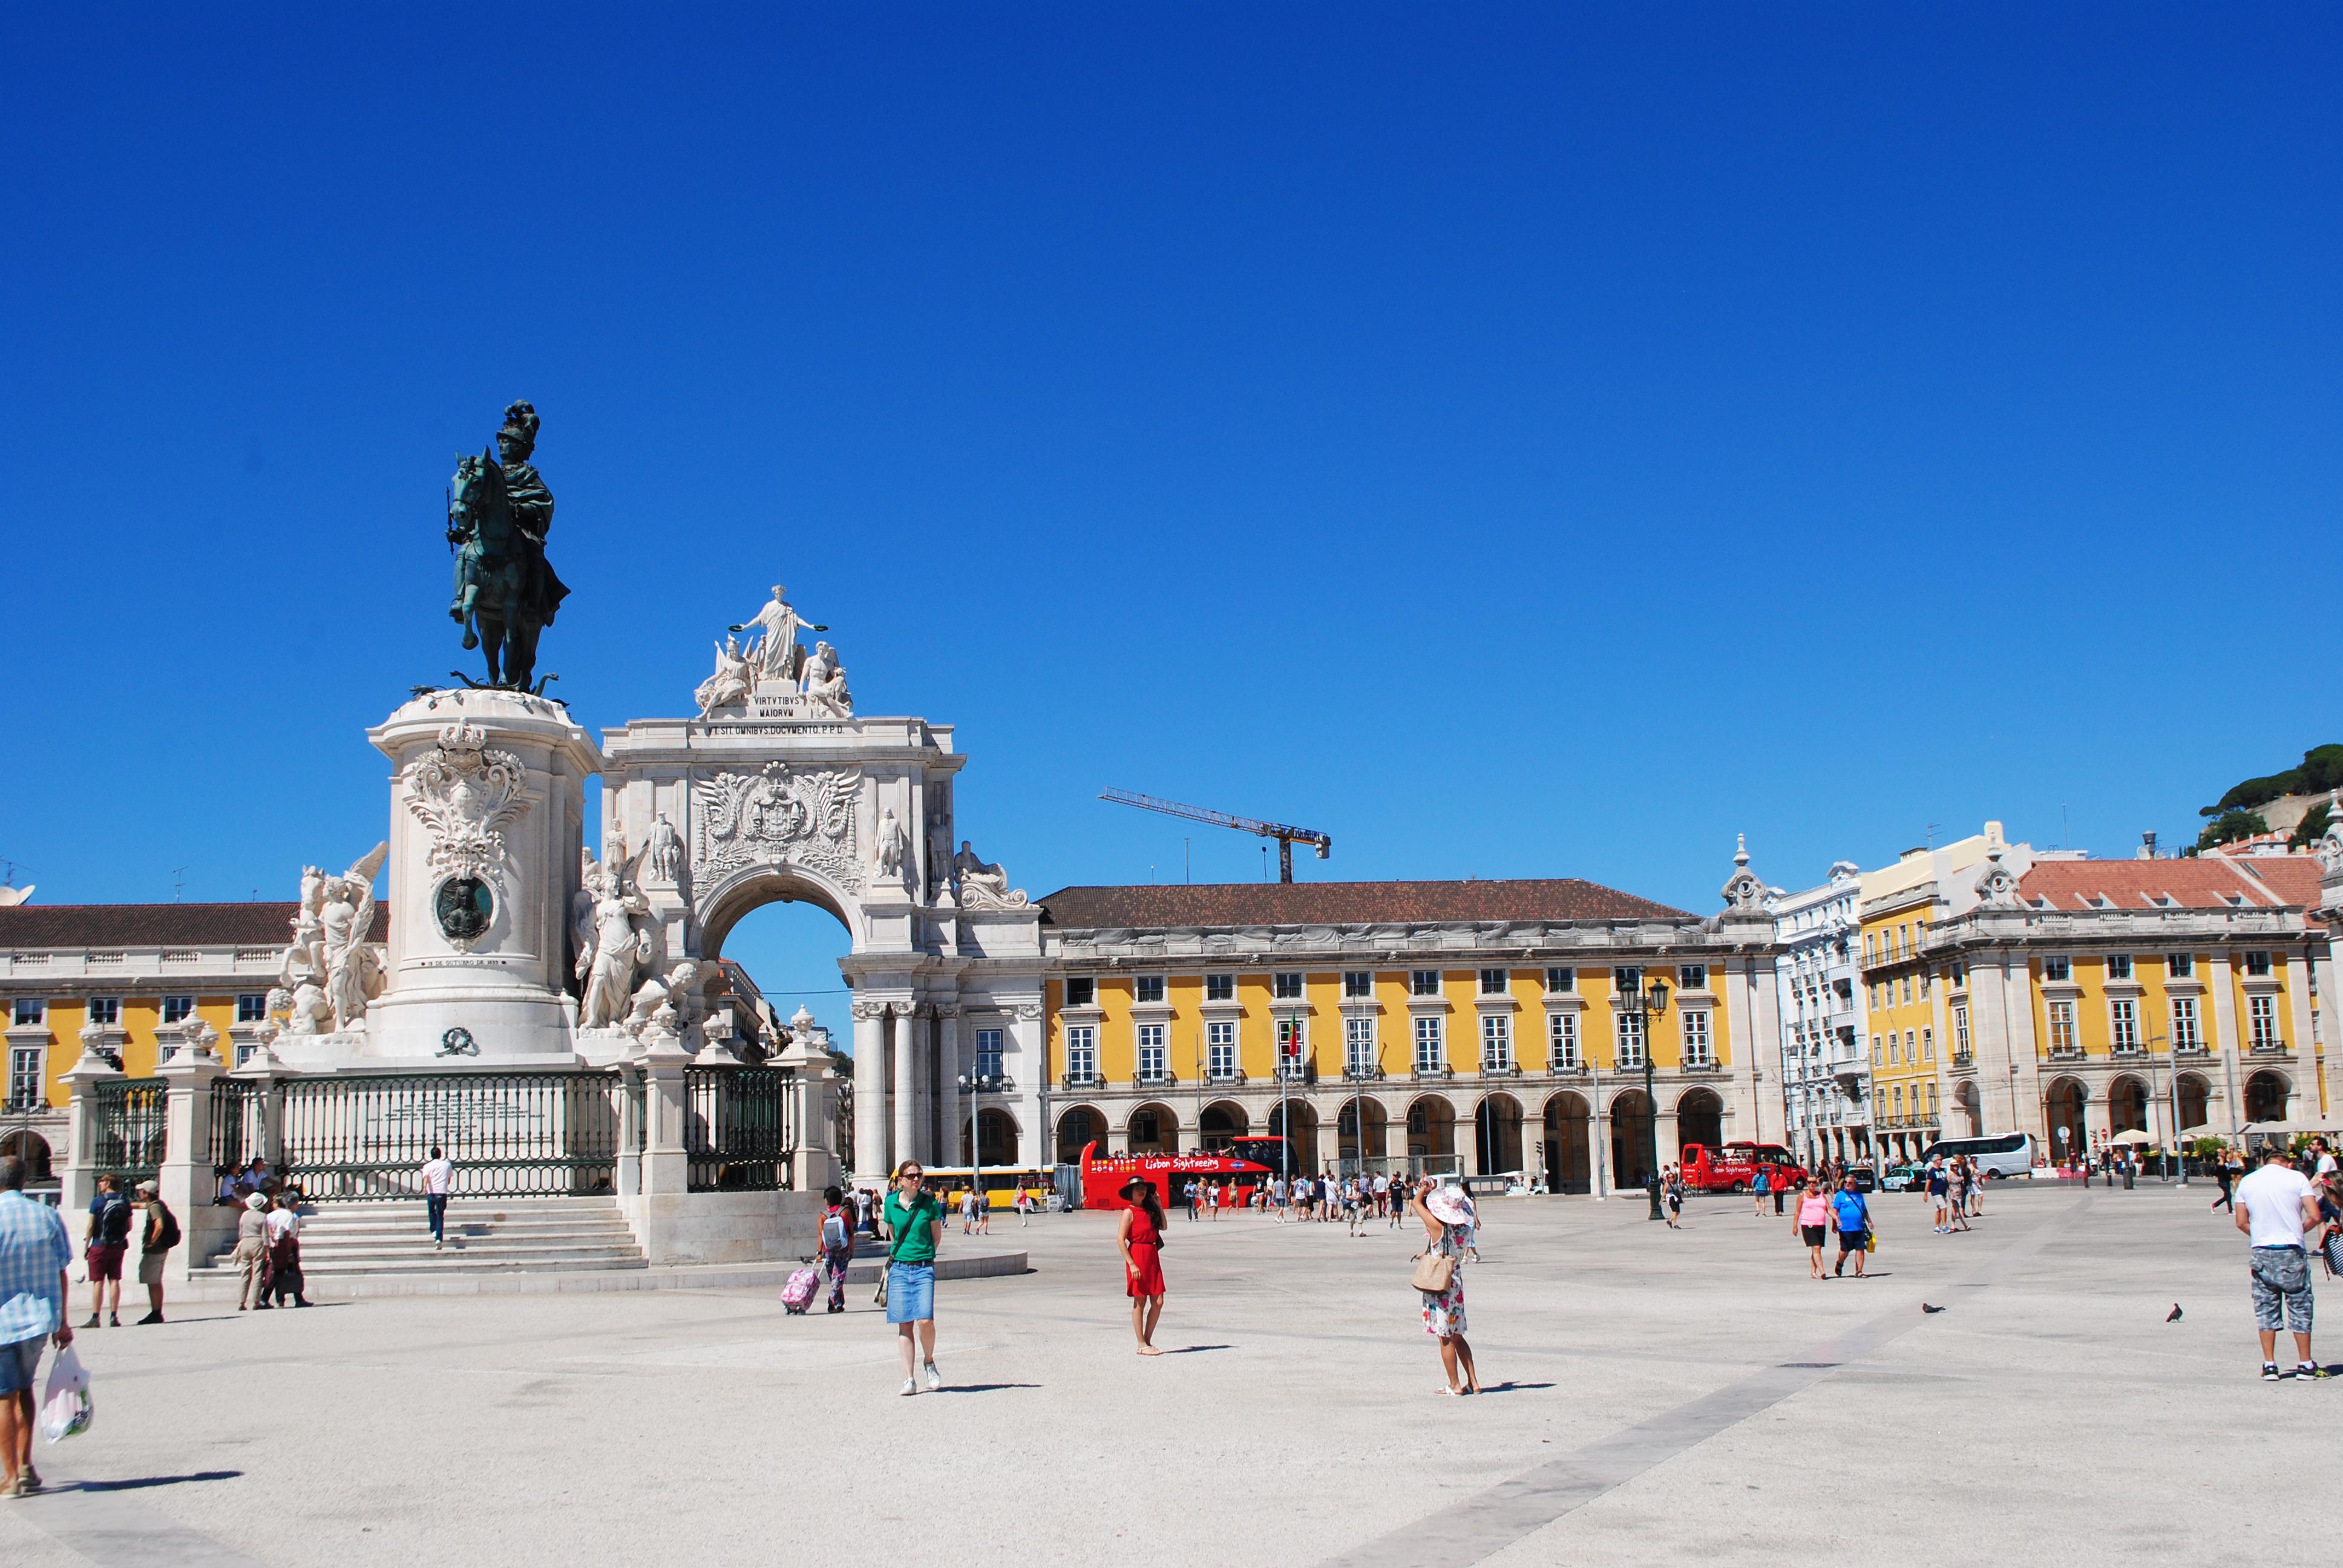 PORTUGALIA - WIOSNA 2018: Fenicius Charme Hotel***, 4 dni (09-12.03.2018 r.), śniadania: 1279,00 PLN/osoba